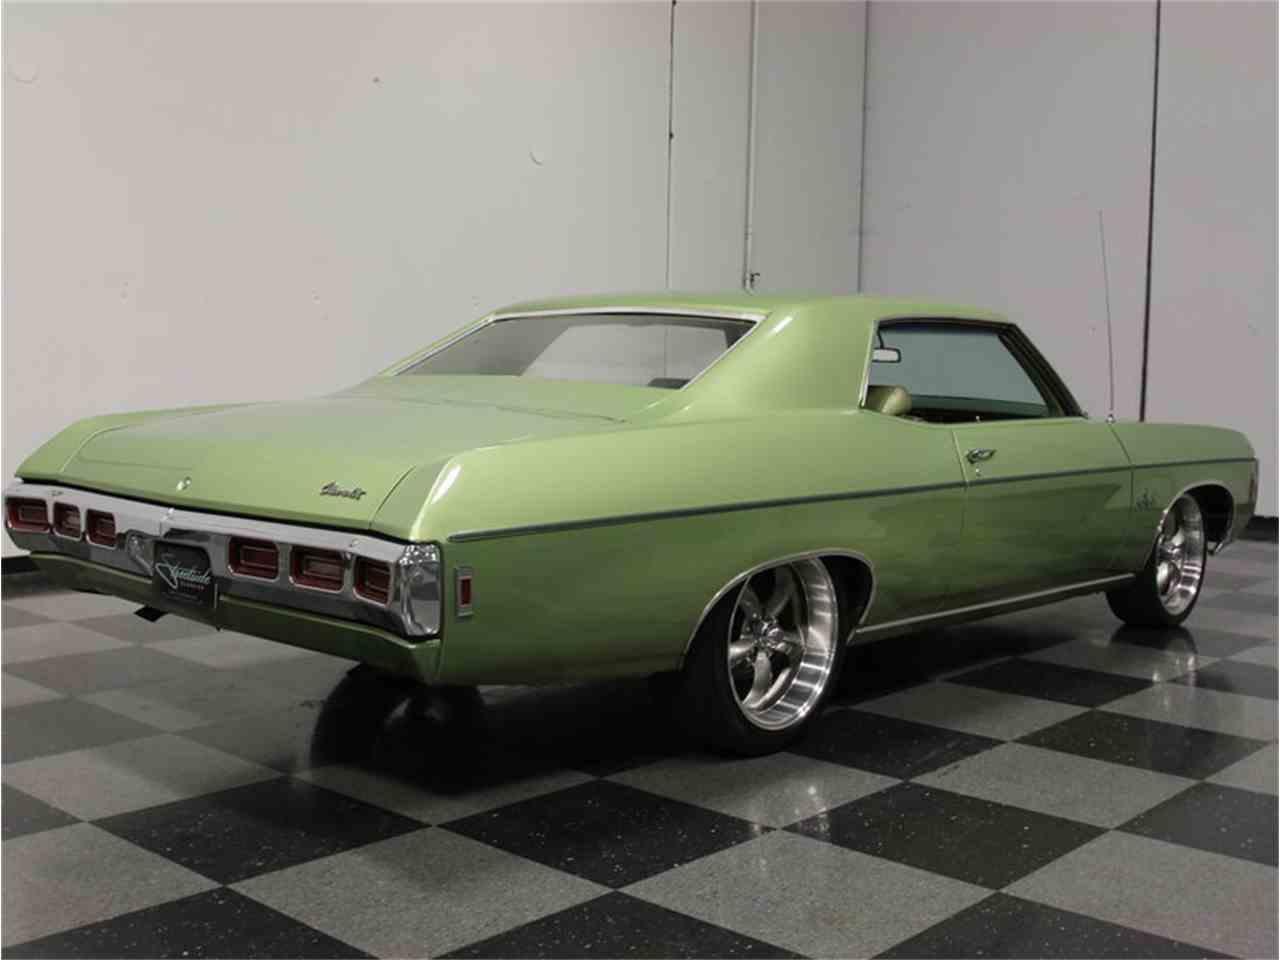 1969 chevrolet impala for sale cc 679515. Black Bedroom Furniture Sets. Home Design Ideas